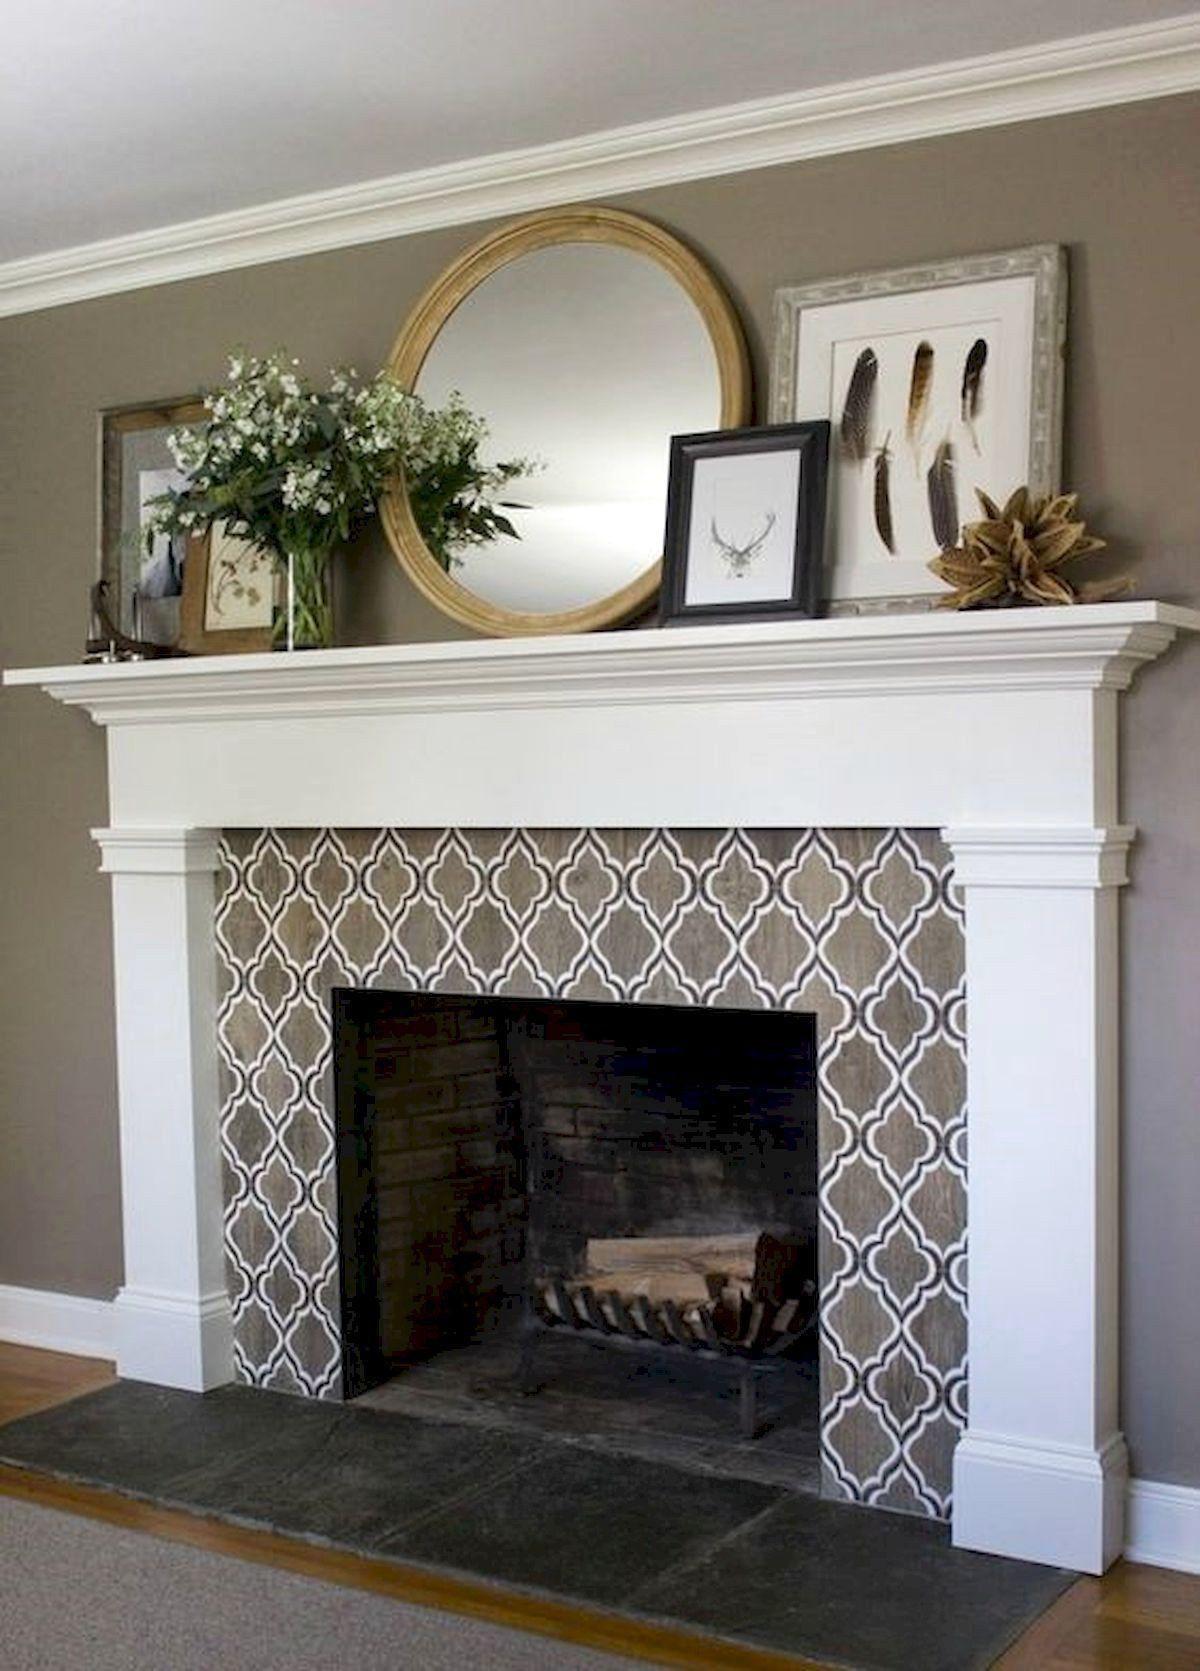 38 Best Modern Farmhouse Fireplace Mantel Decor Ideas Fireplace Mantel Decor Farmhouse Fireplace Mantels Craftsman Fireplace